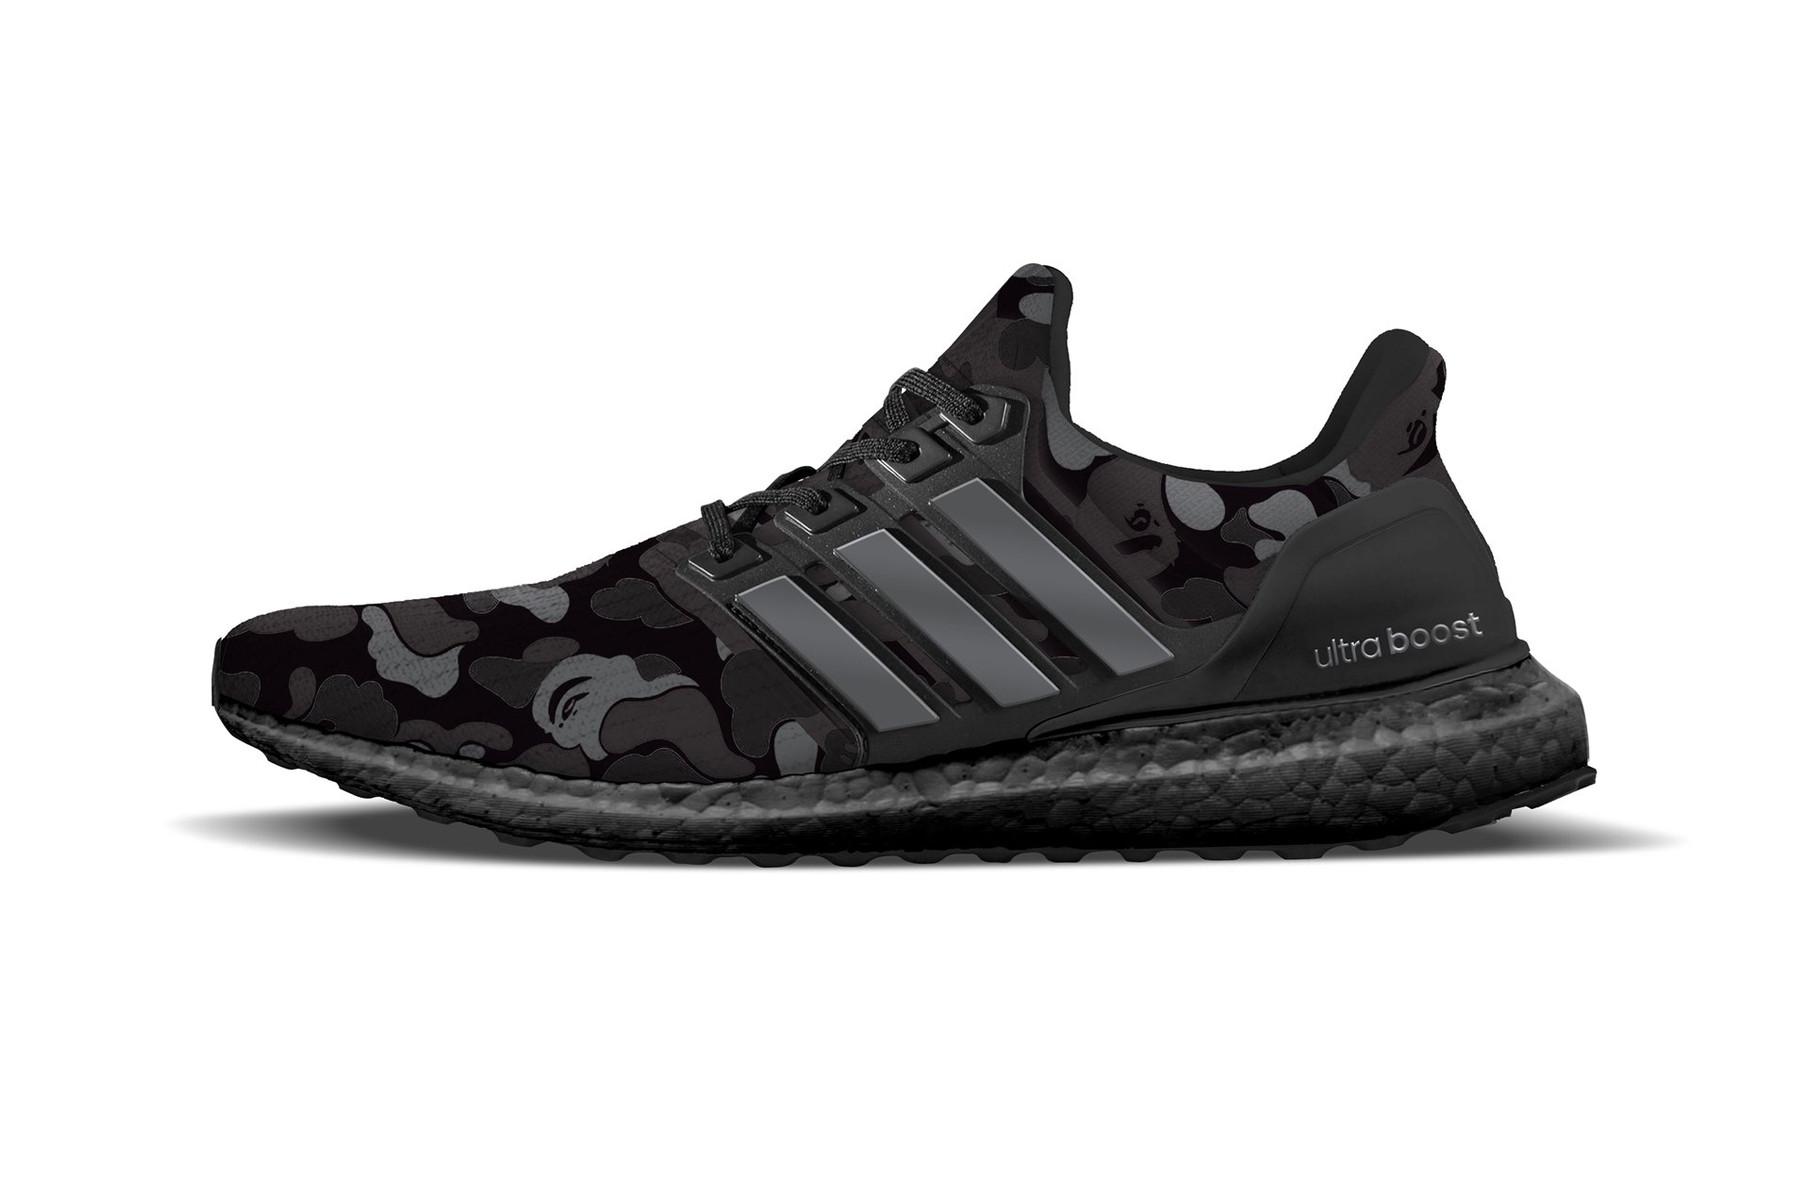 BAPE & adidas Set to Release Black Camo UltraBOOST Trainer